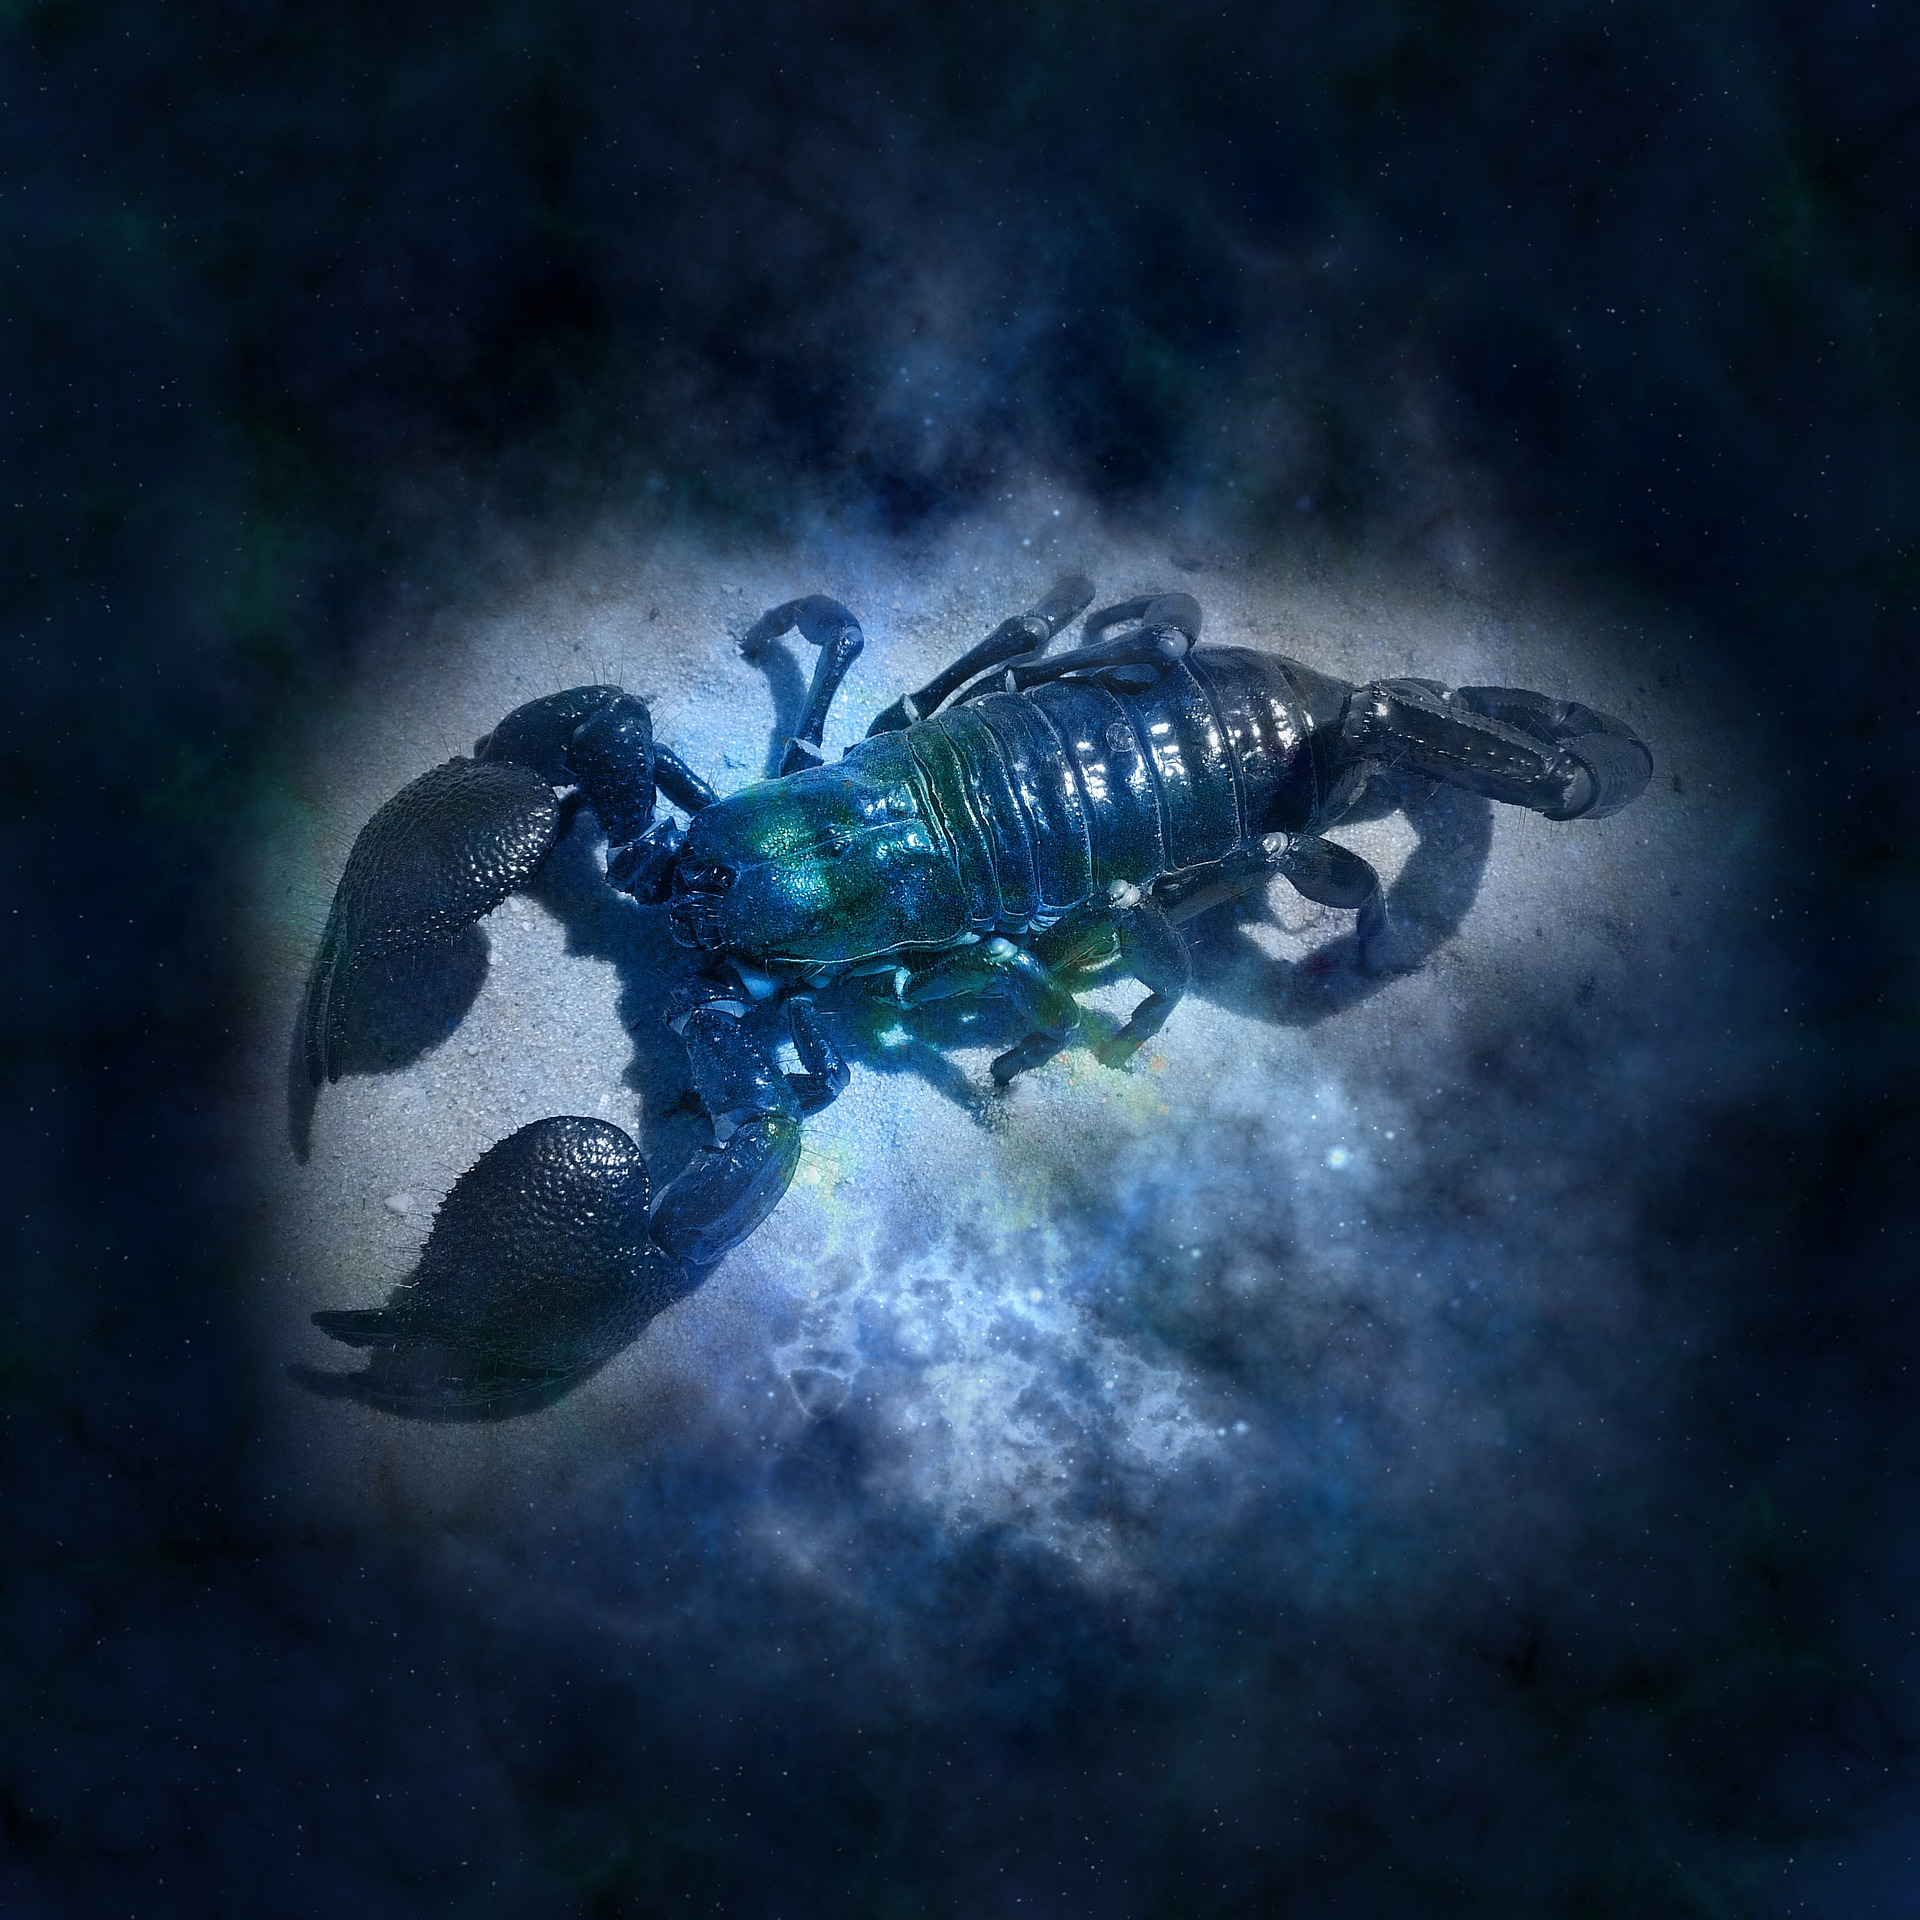 Mercure rétrograde en Scorpion octobre 2020